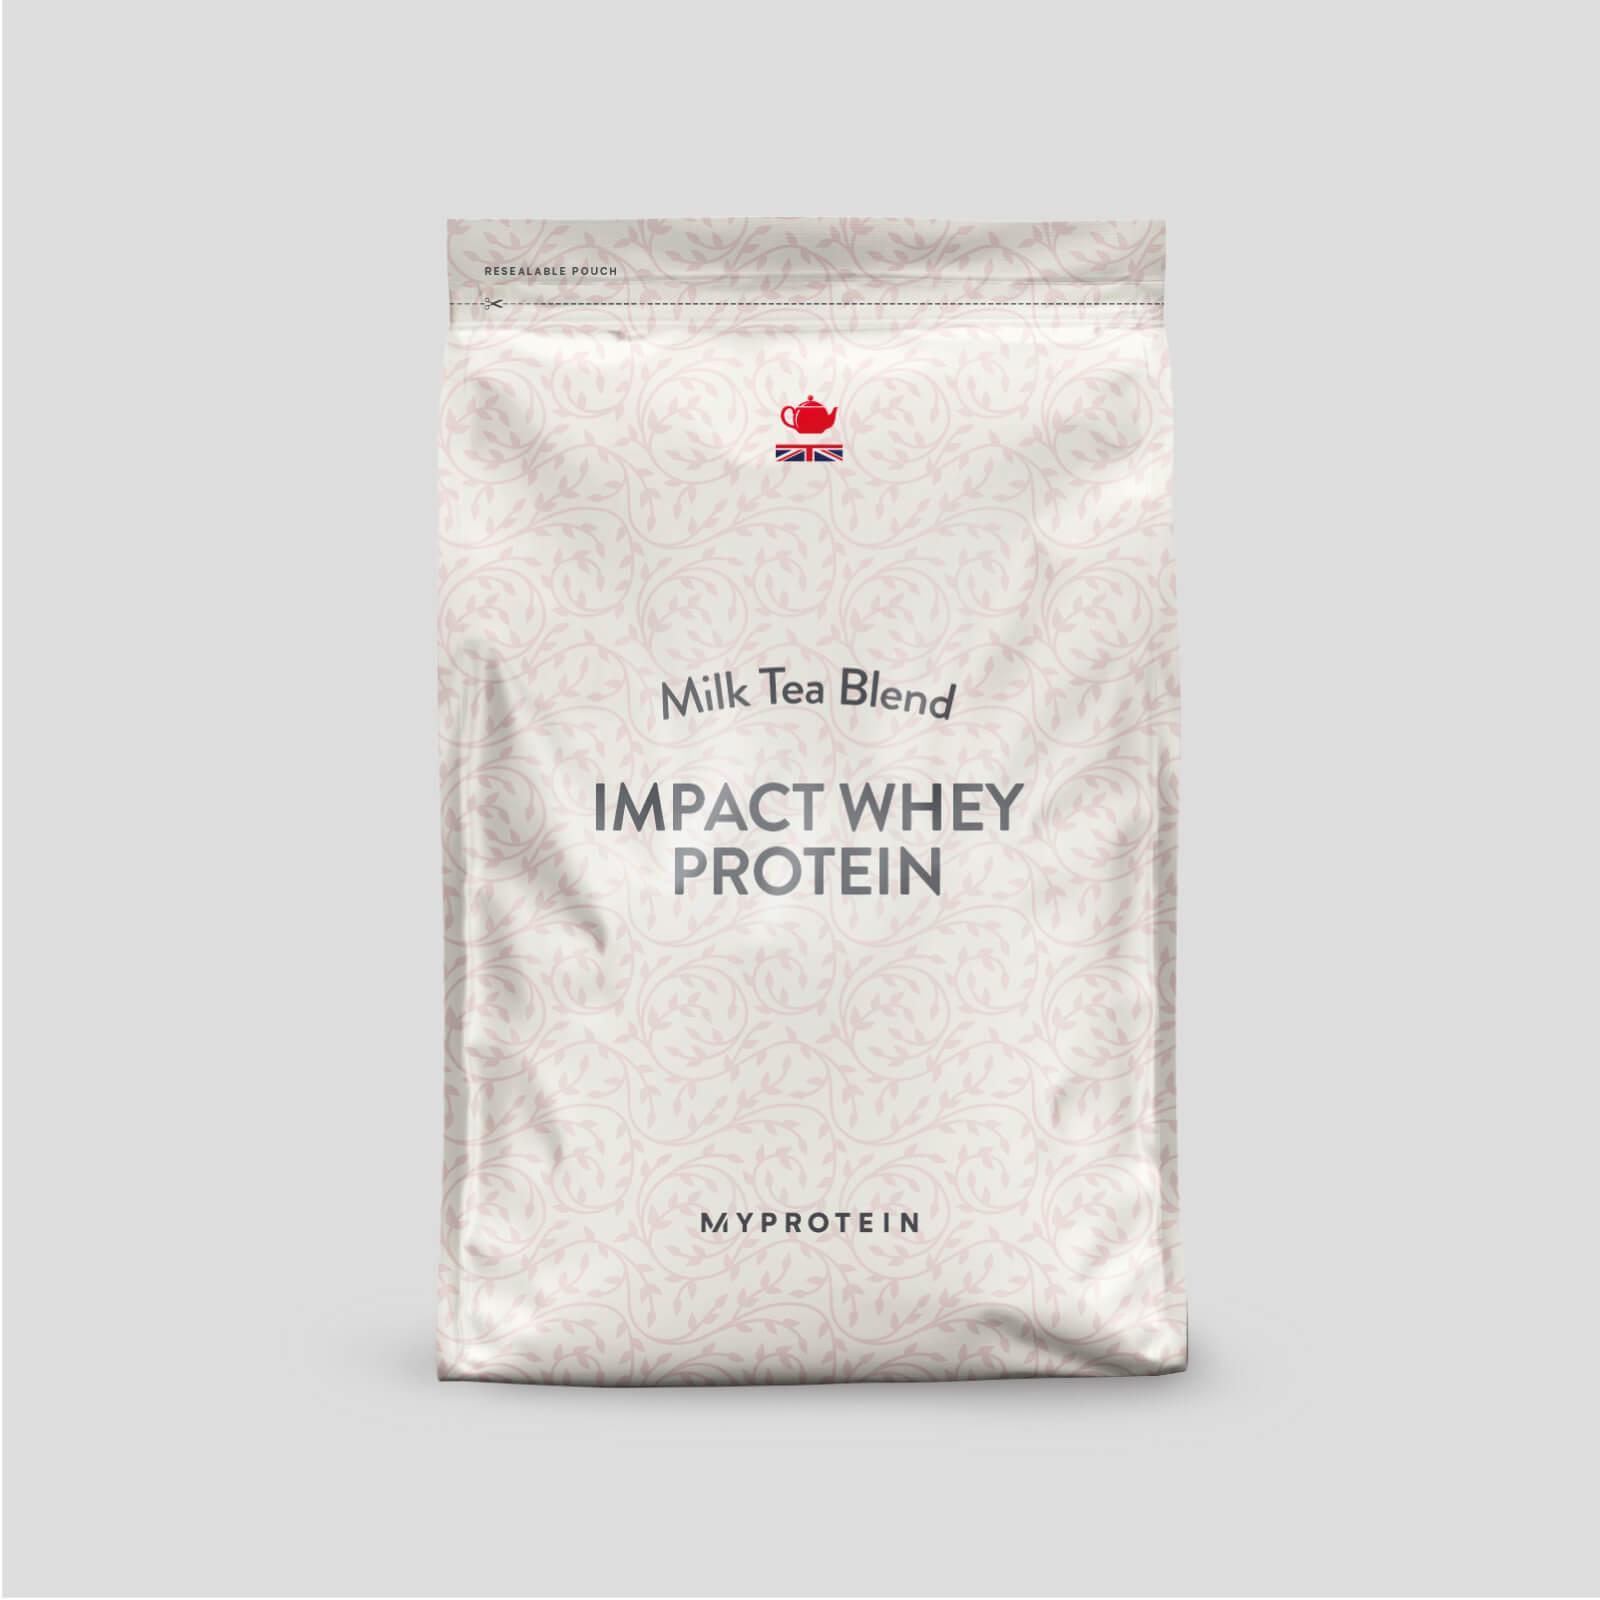 Myprotein Impact Whey Protein - 1kg - Milk Tea